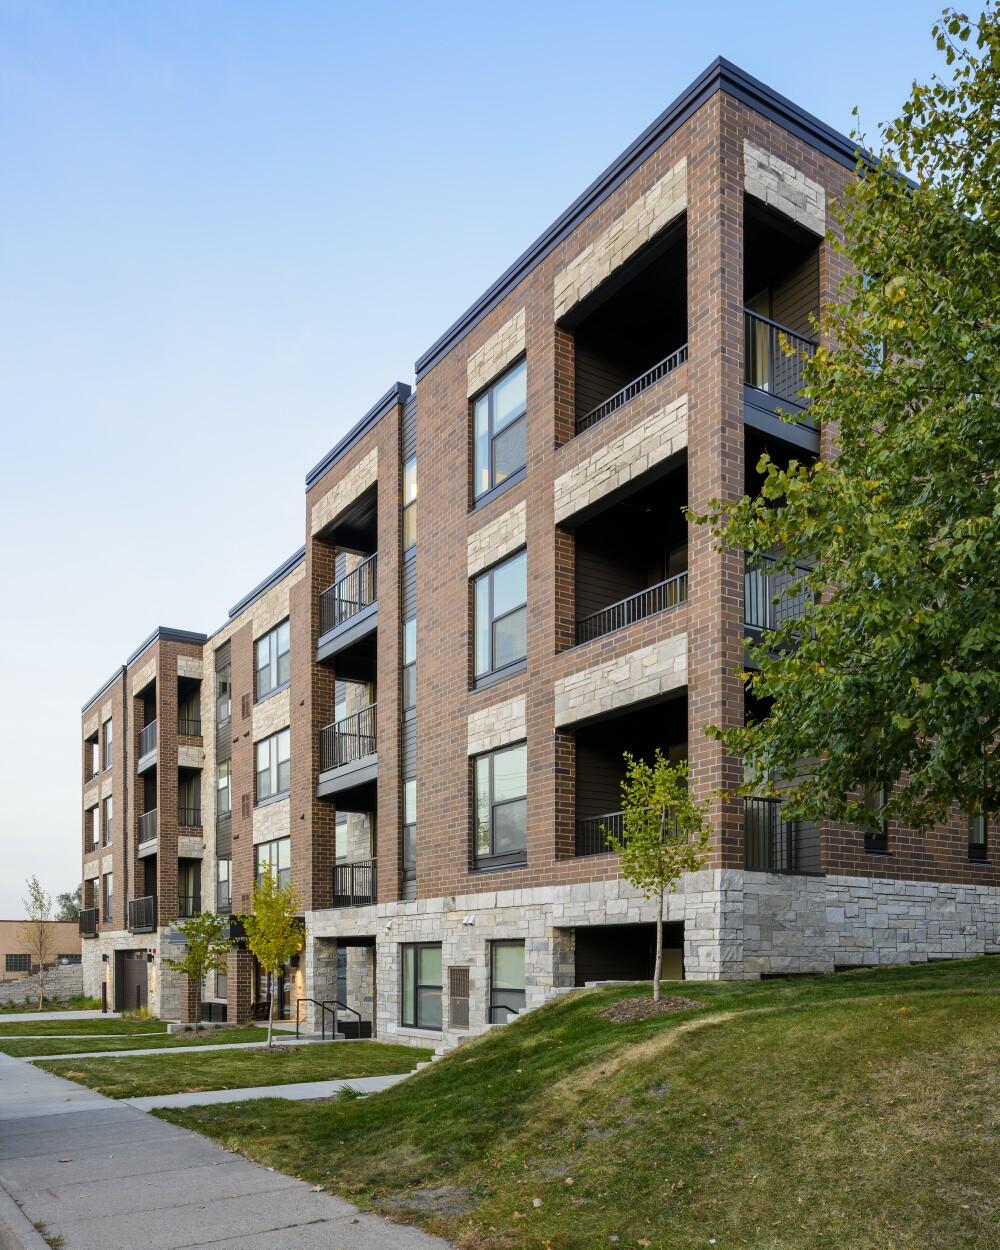 Elements-of-Linden-Hills-Apartment-Minneapolis-Minnesota-Exterior (resized).jpg